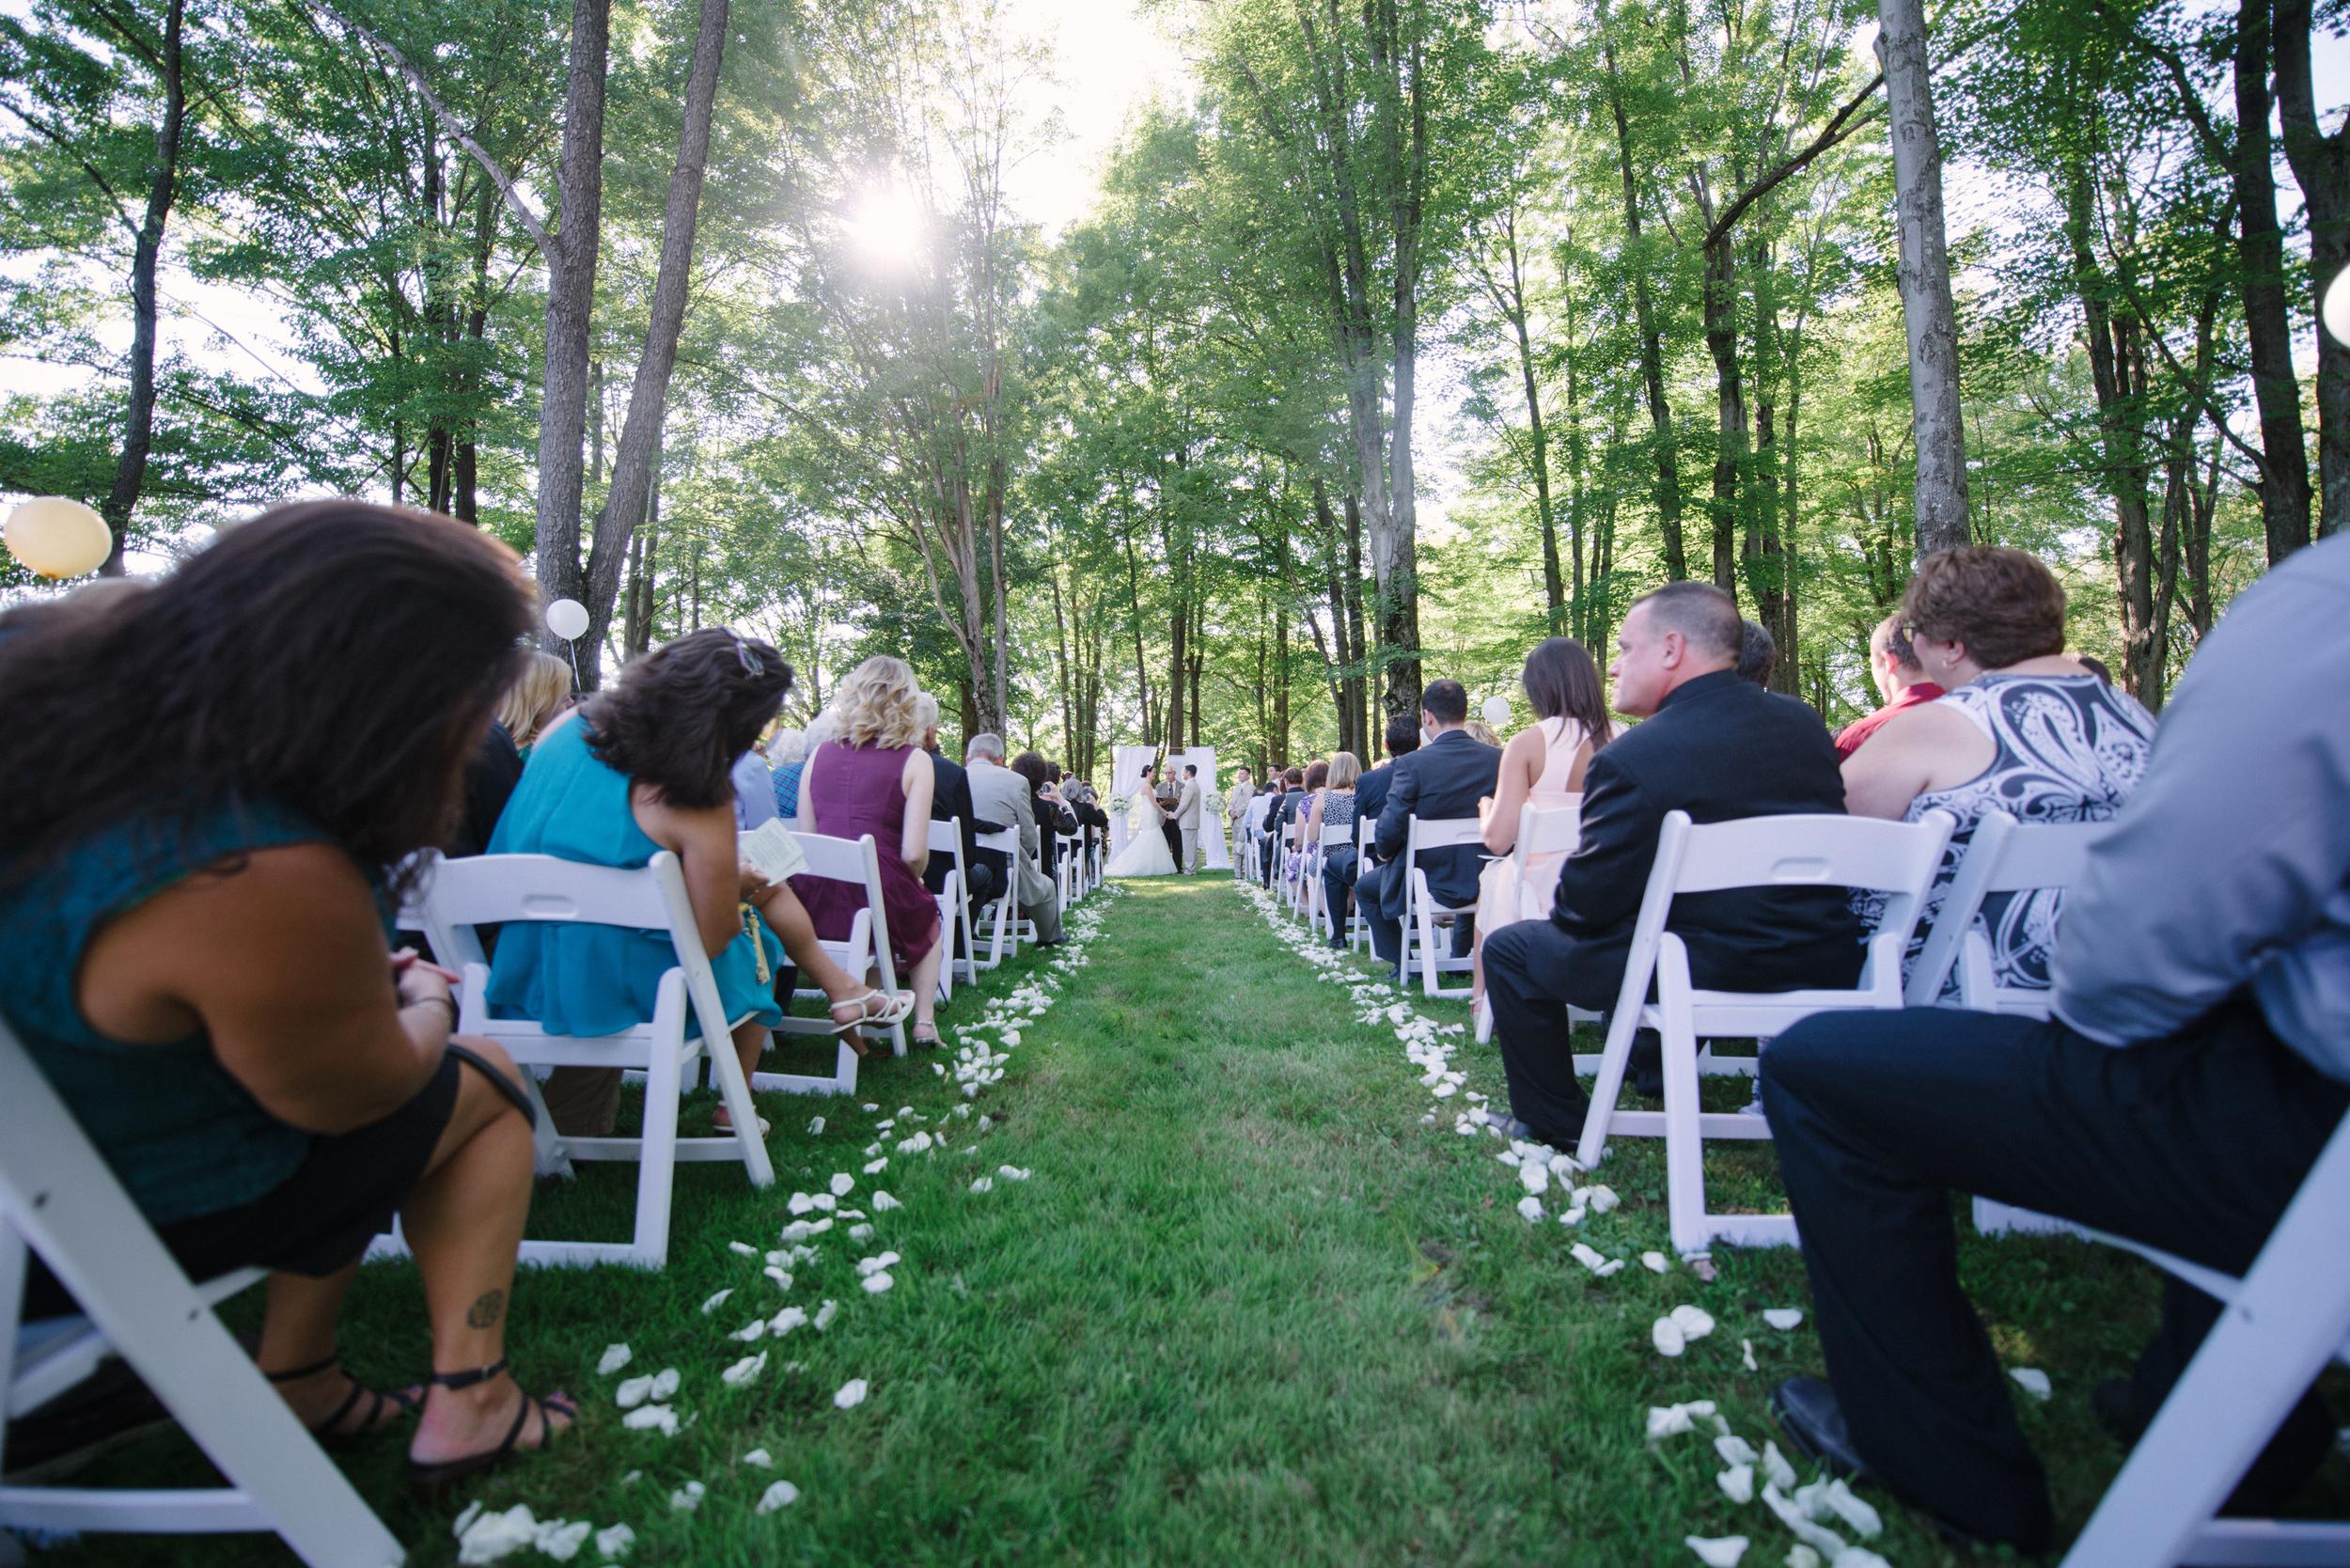 Matt_Swetel_Photography_Erin_and_Jeff_married035.jpg